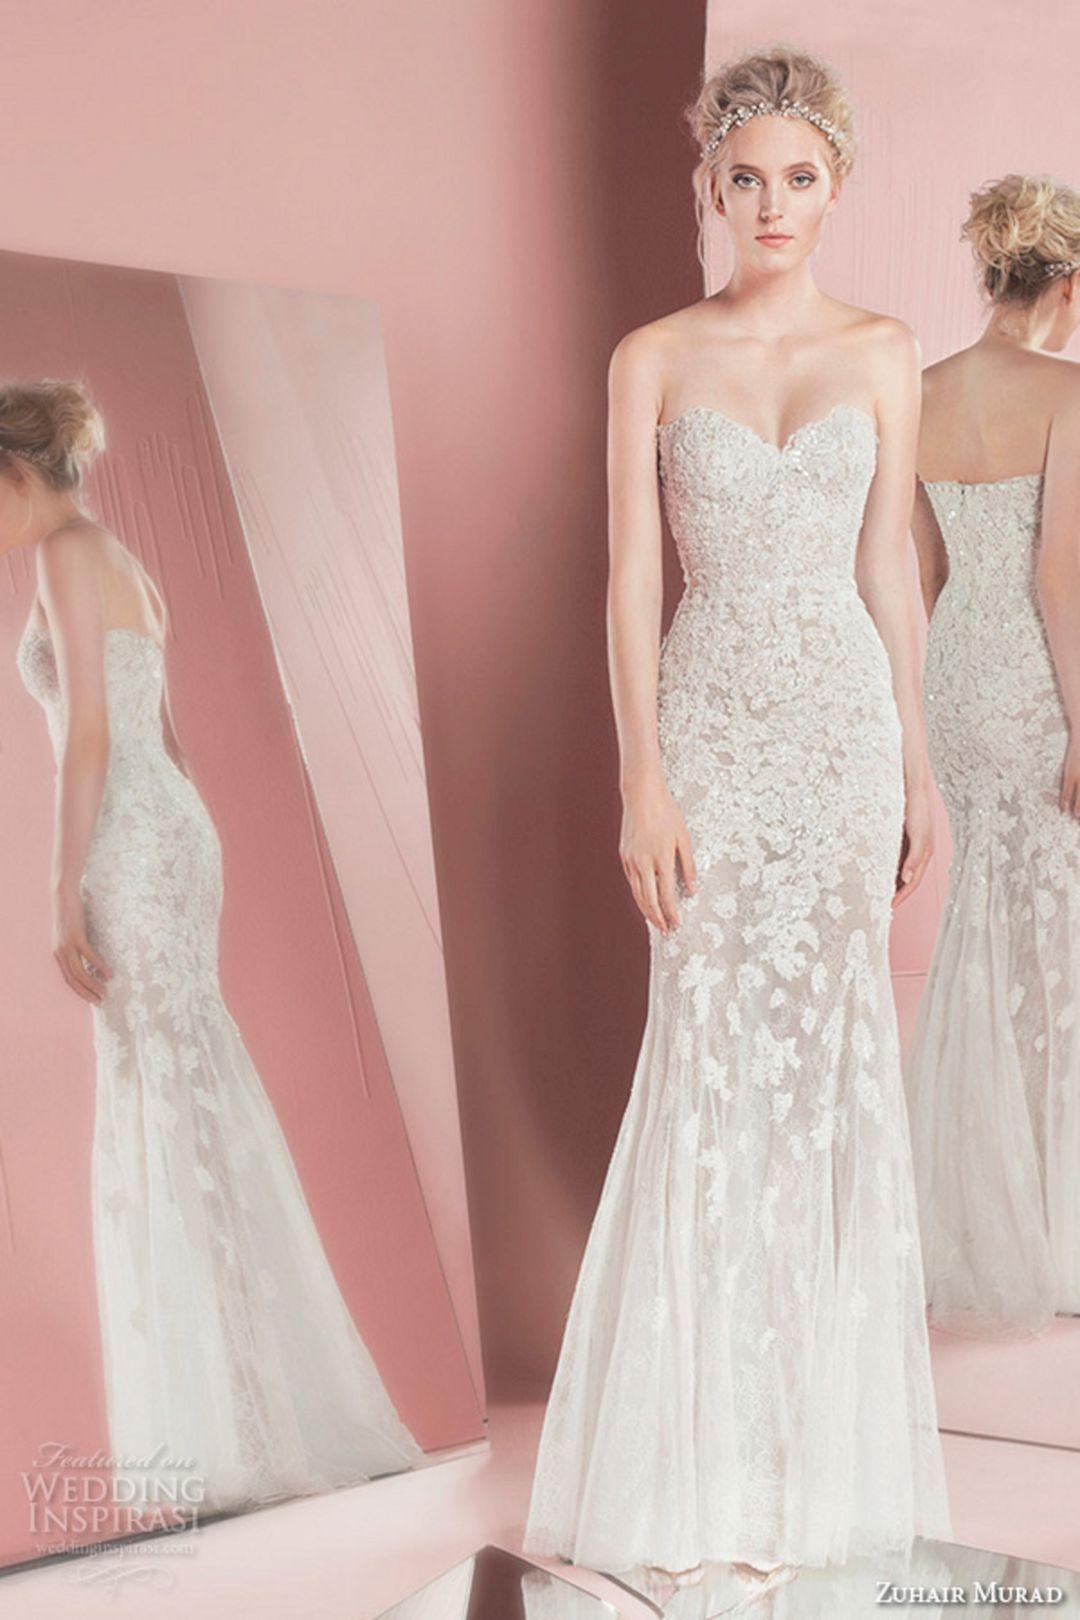 lovely spring wedding dresses design ideas for bride wedding